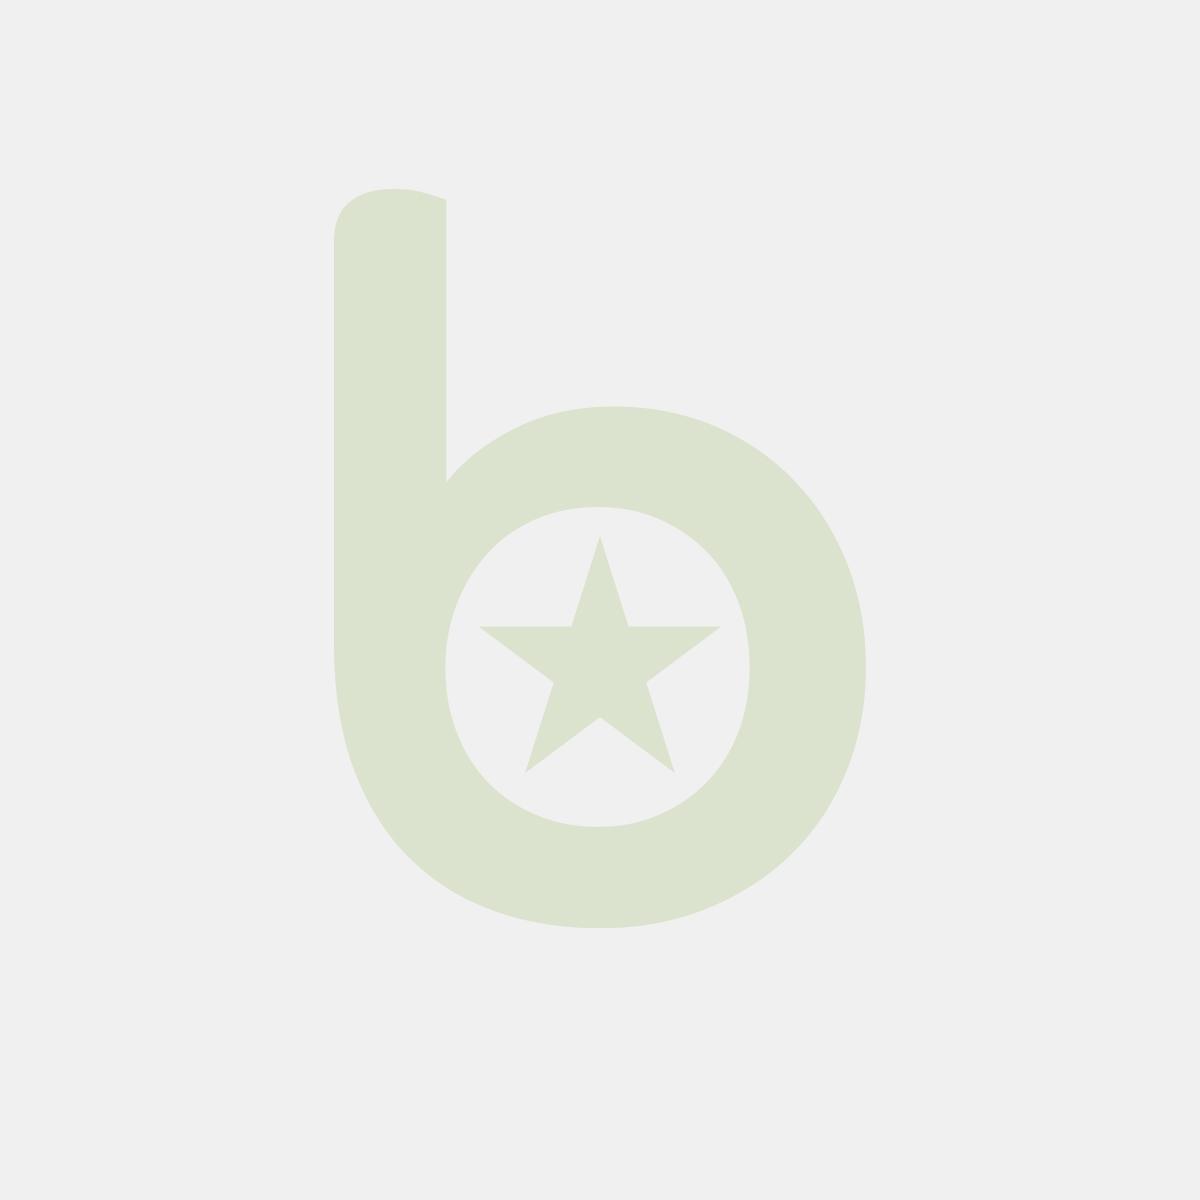 Reklamówki biodegradowalne eko 27/7/50 zgodnie z normą EN 13432:2002 op. 500 sztuk